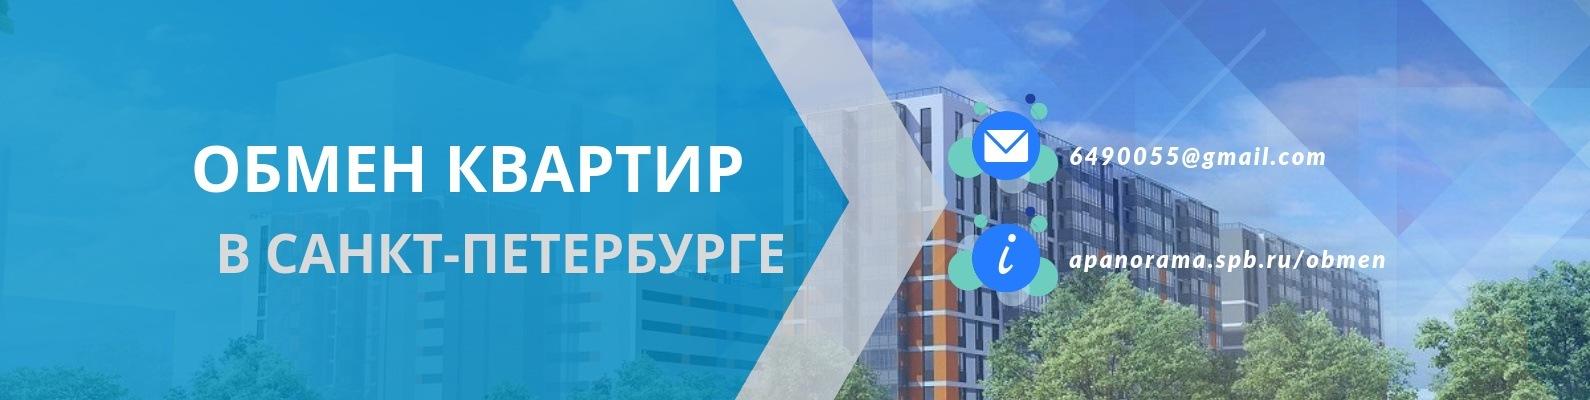 8e6192227a703 Обмен квартир в Санкт-Петербурге | ВКонтакте